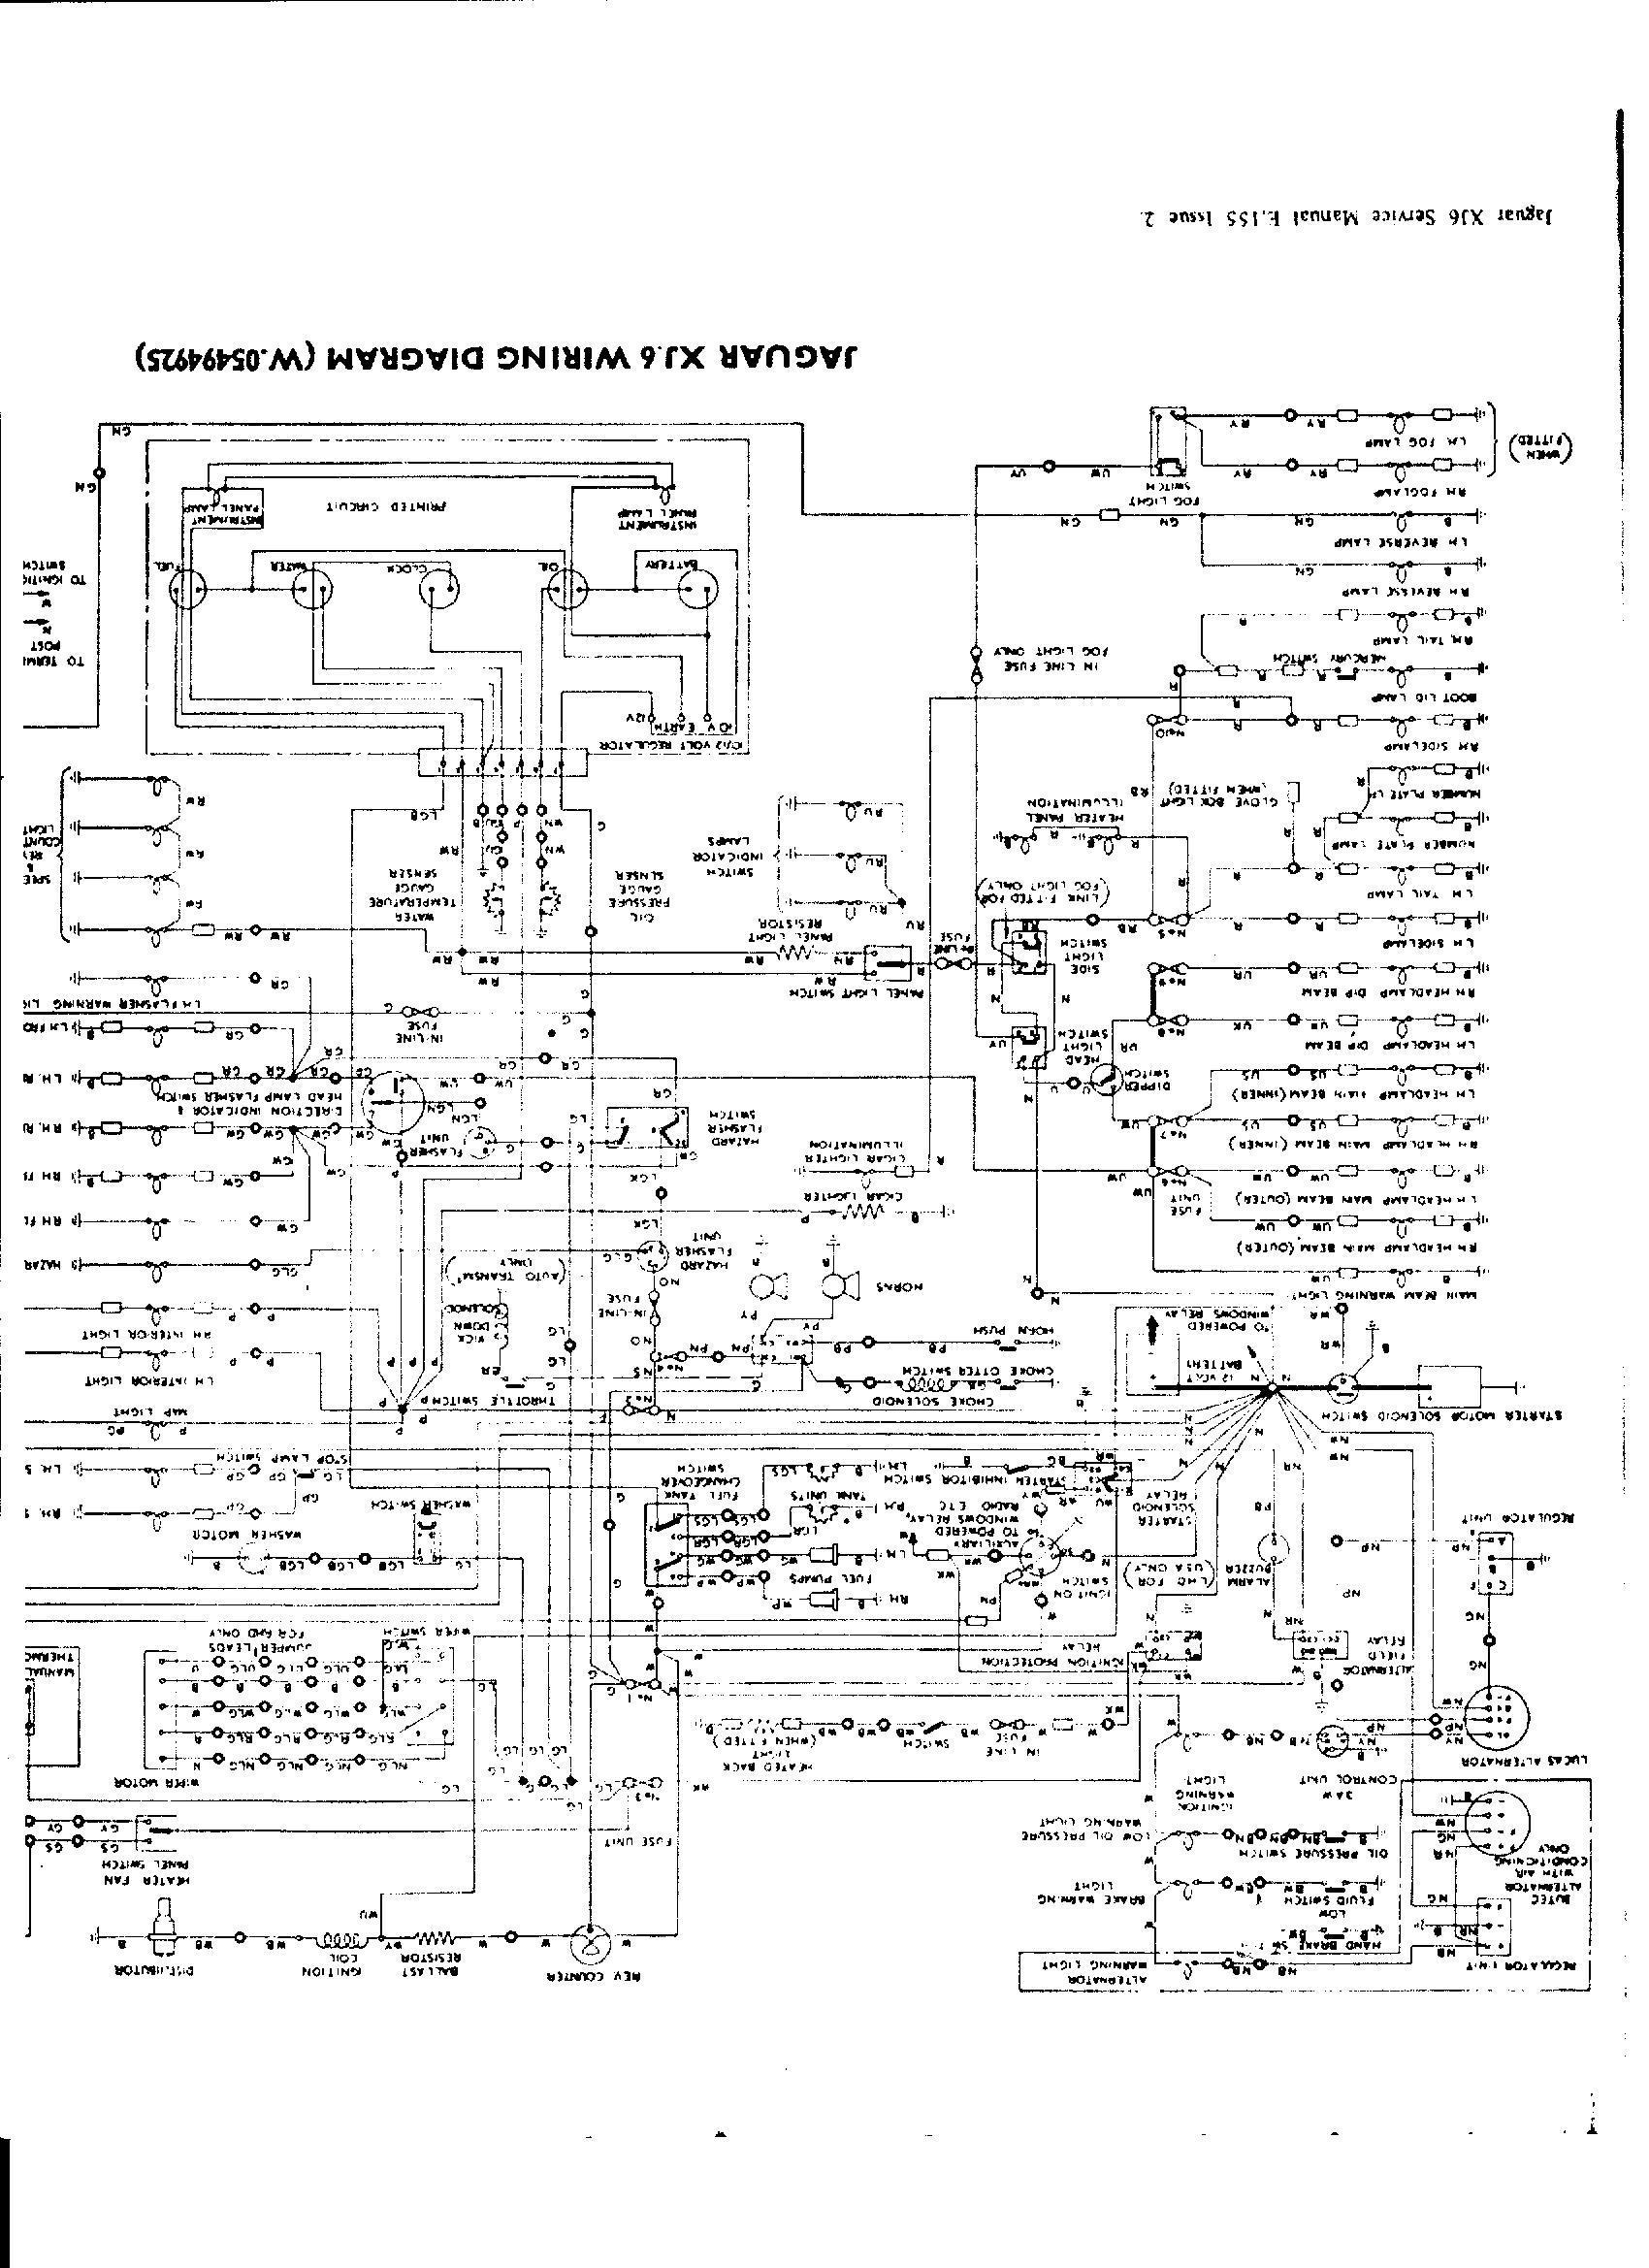 Super 743 Bobcat Wiring Diagram Wiring Library Wiring Cloud Itislusmarecoveryedborg